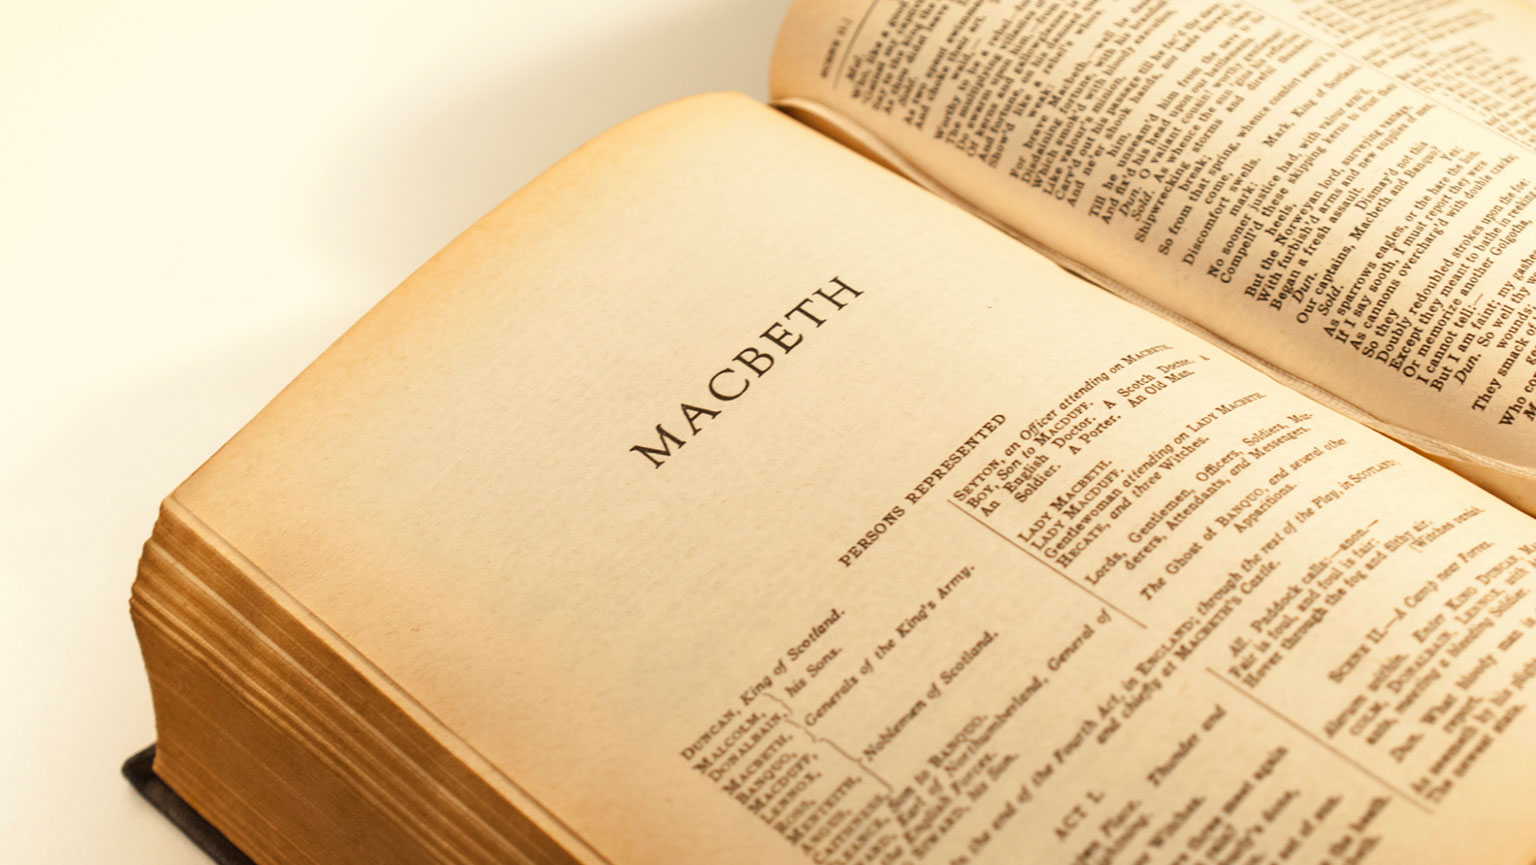 Macbeth—Musing on Murder